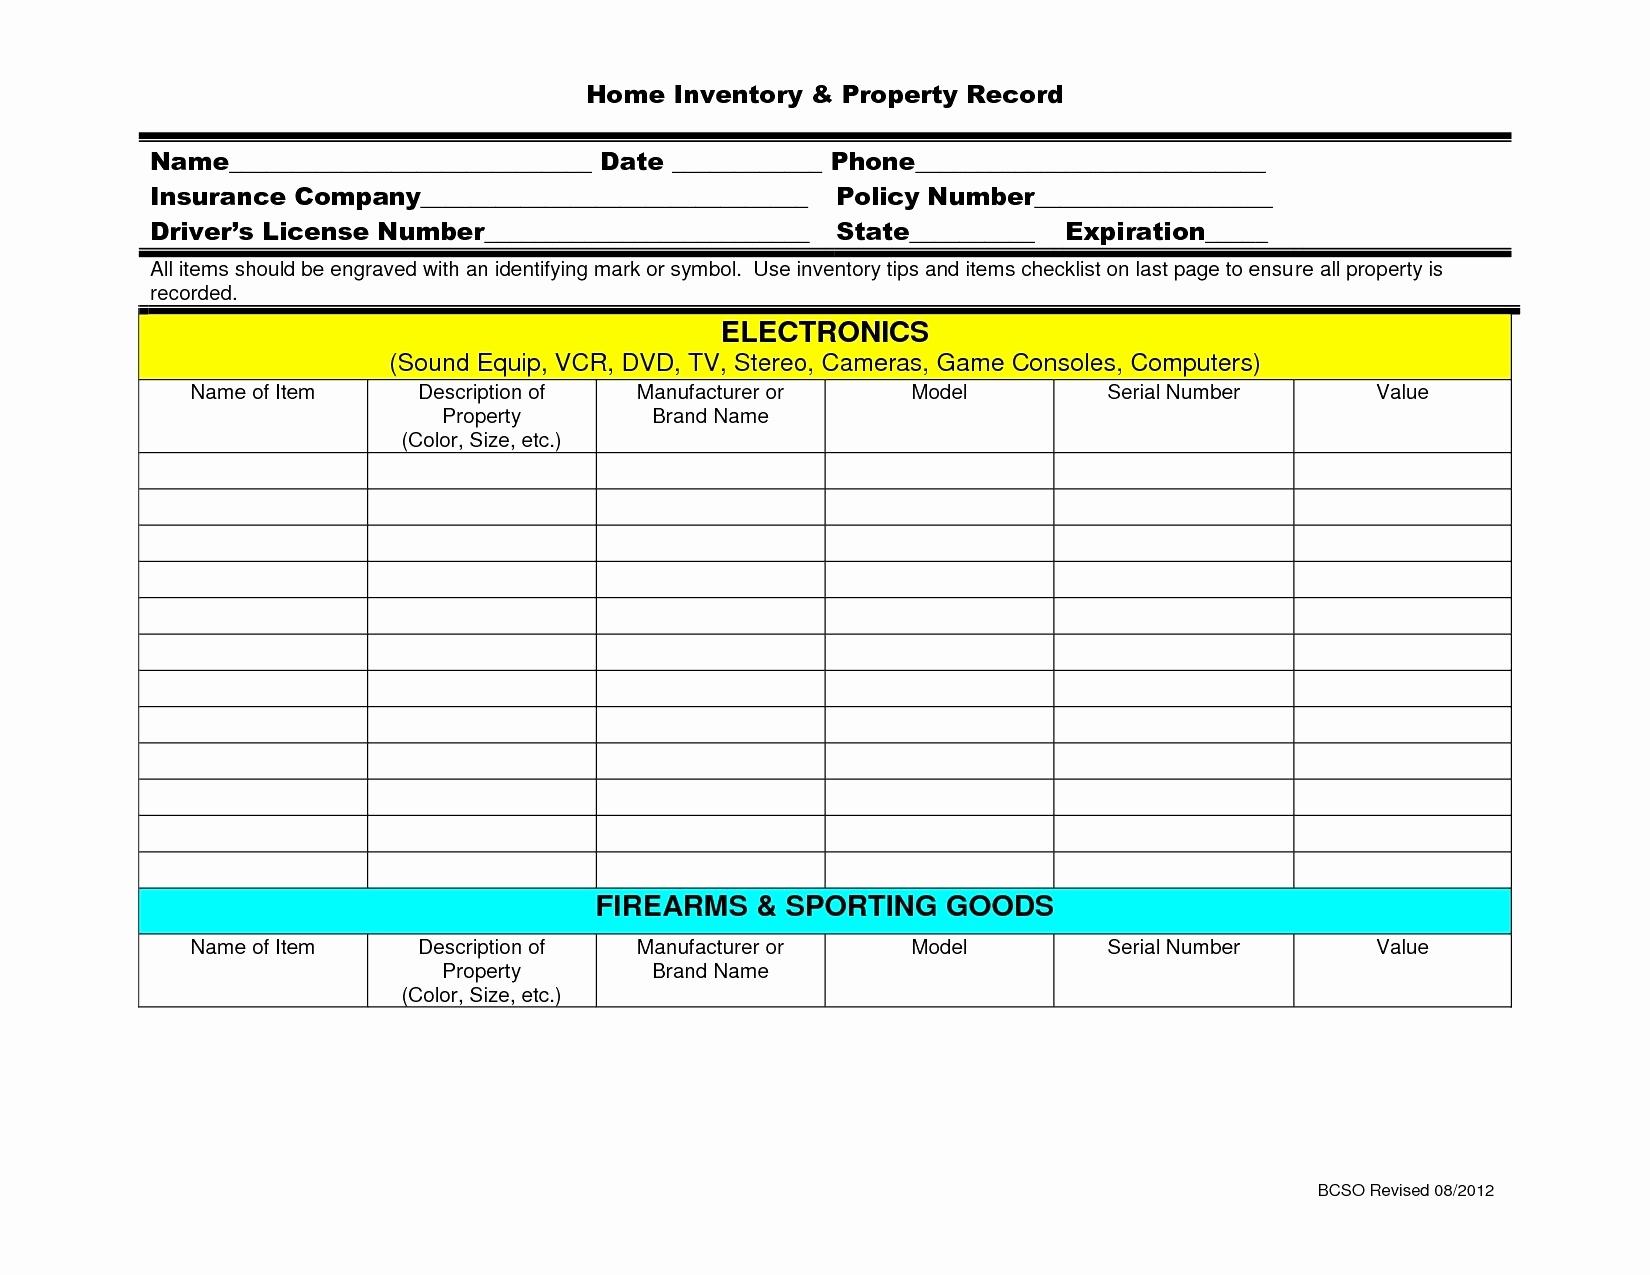 Firearms Inventory Spreadsheet With Gun Inventory Spreadsheet Jewelry Pywrapper Firearms